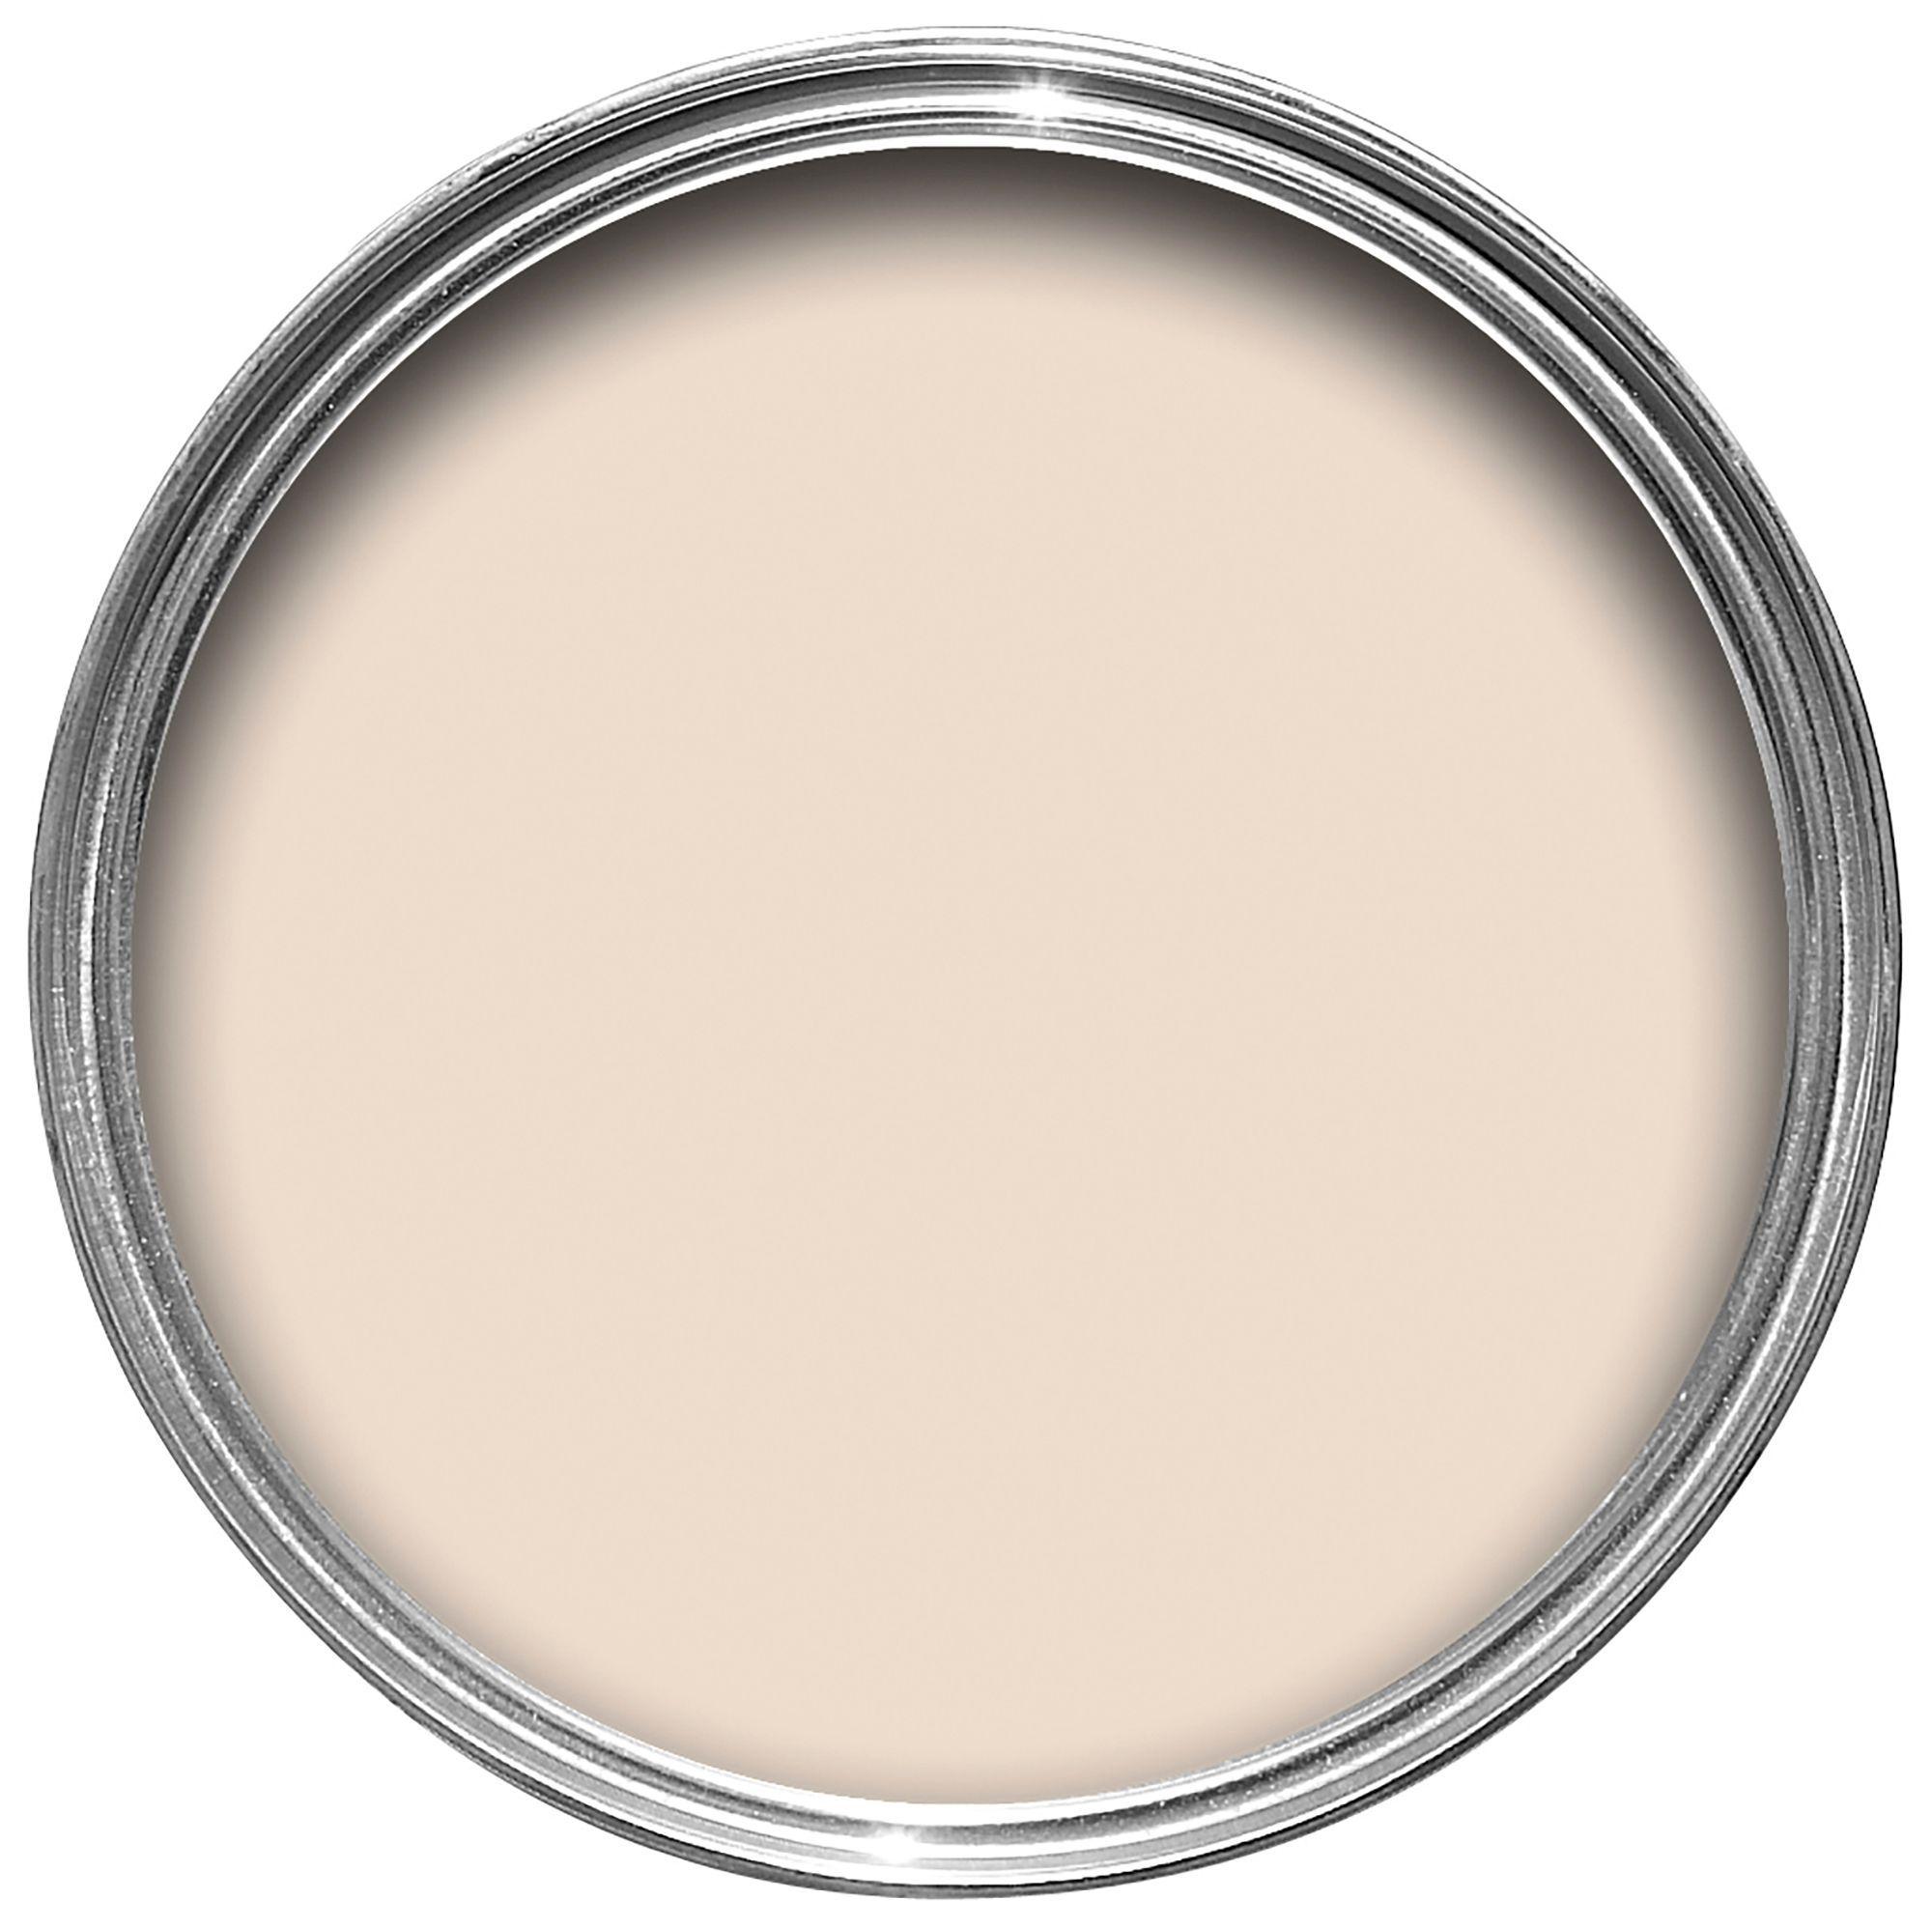 dulux neutrals almost oyster matt emulsion paint 50ml. Black Bedroom Furniture Sets. Home Design Ideas